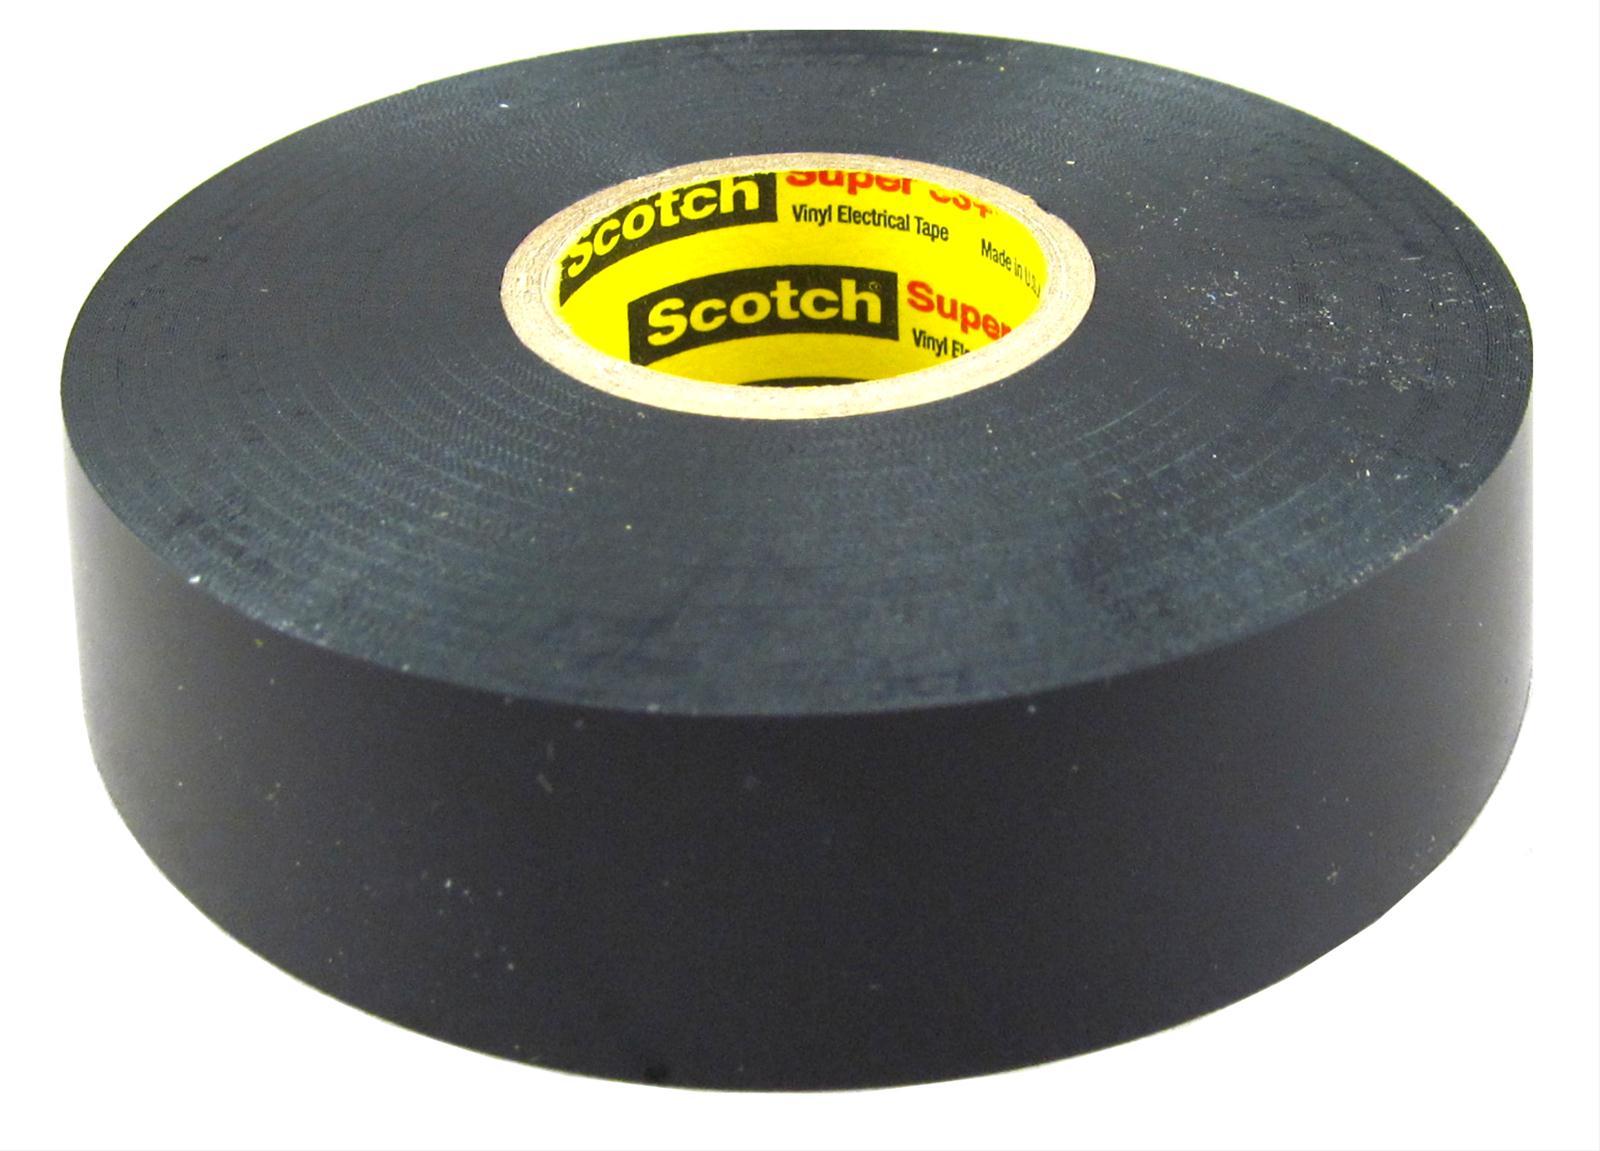 3M Products Scotch Super 33 Plus Vinyl Electrical Tape 06132